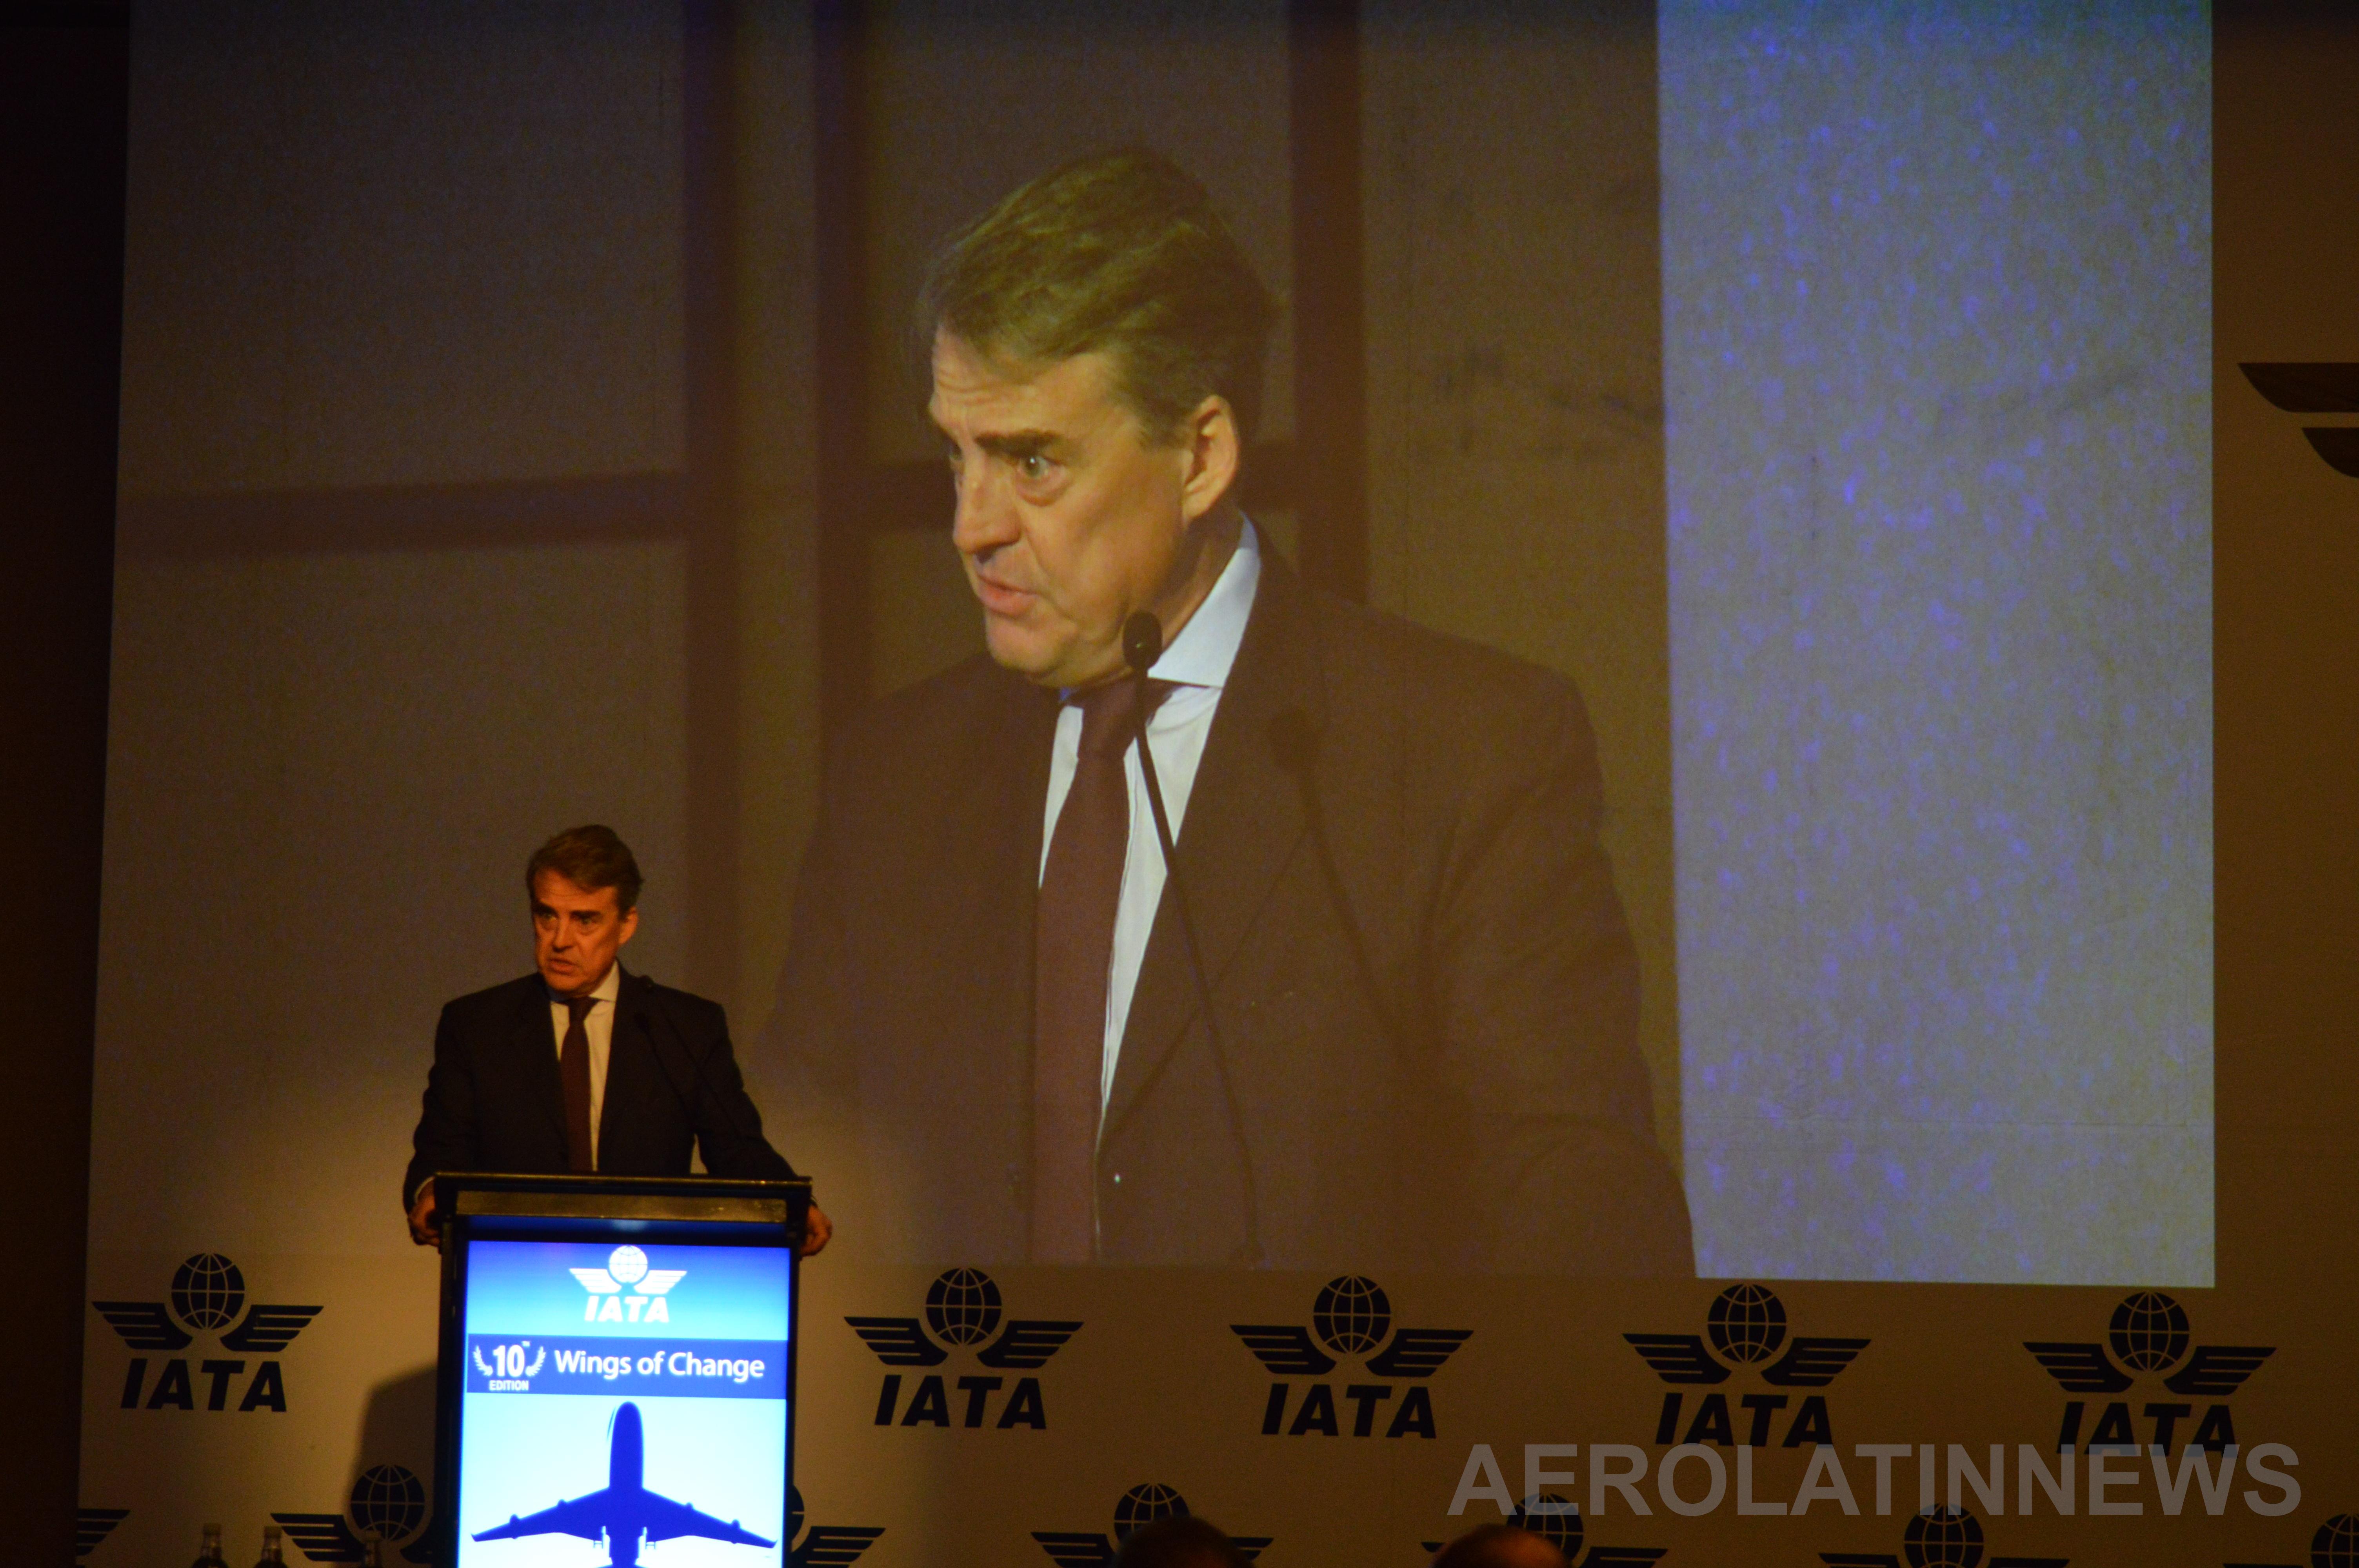 O Recado da IATA